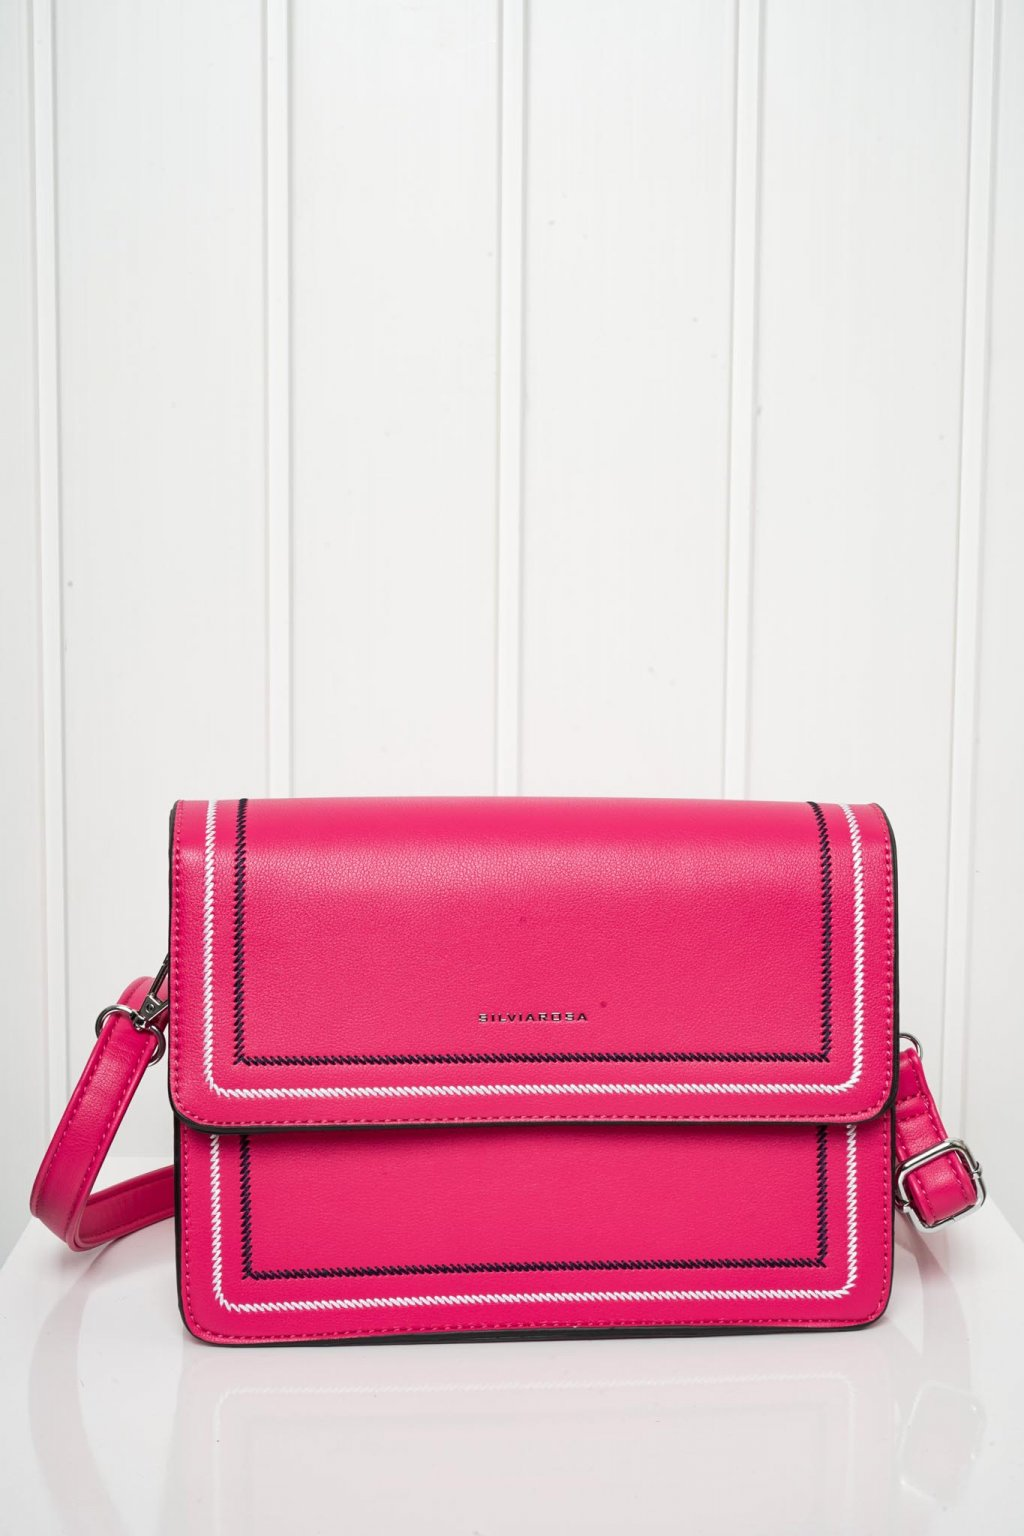 Kabelka, crossbody, ruksak, shopping bag, shopperka, 205